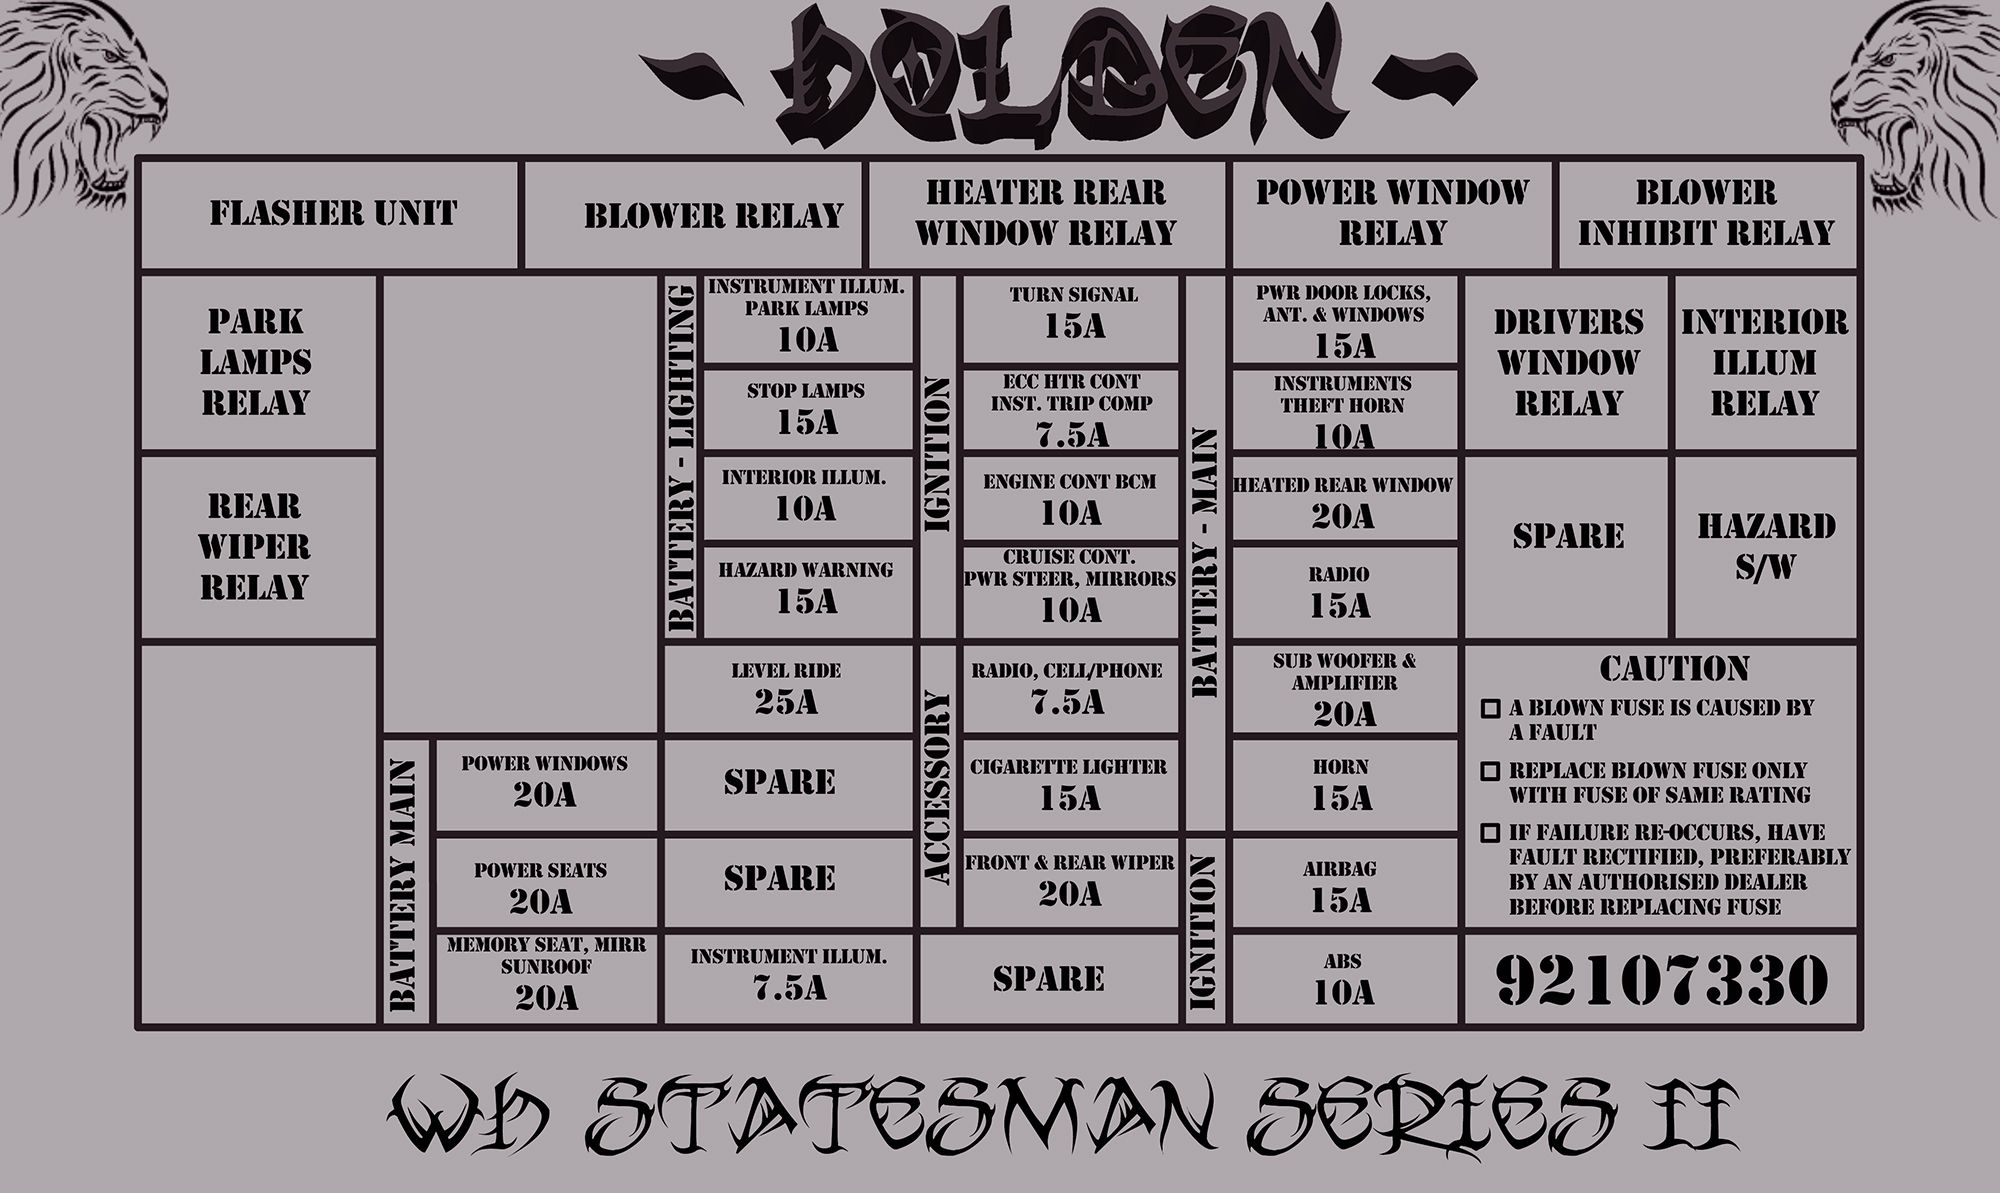 medium resolution of 2002 wh statesman series ii under dash fuse relay diagram